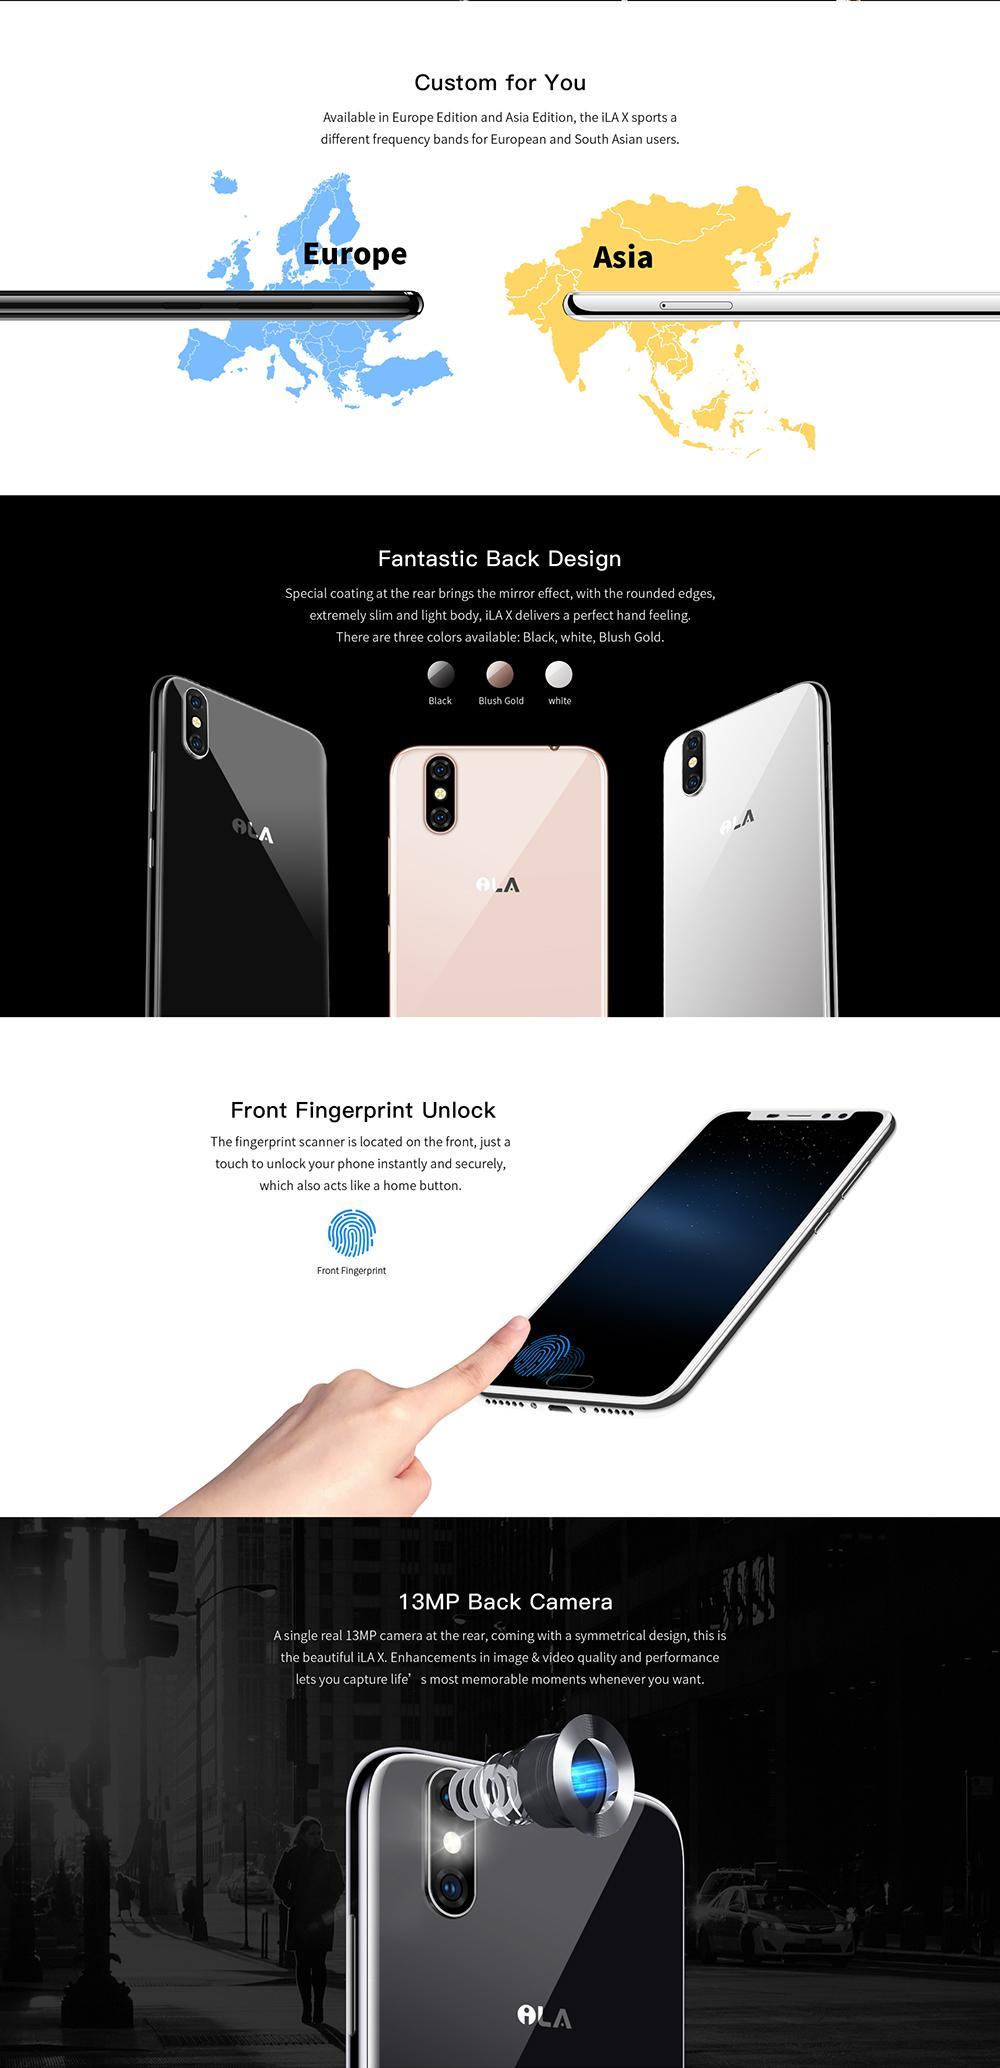 iLA X Smartphone MT6737 Quad Core 1 3GHz 3GB RAM 32GB ROM 5 5 Inch 18:9 HD  Screen 4G Rear Camera13MP Front Camera 5MP Fingerprint Unlock Dual Sim